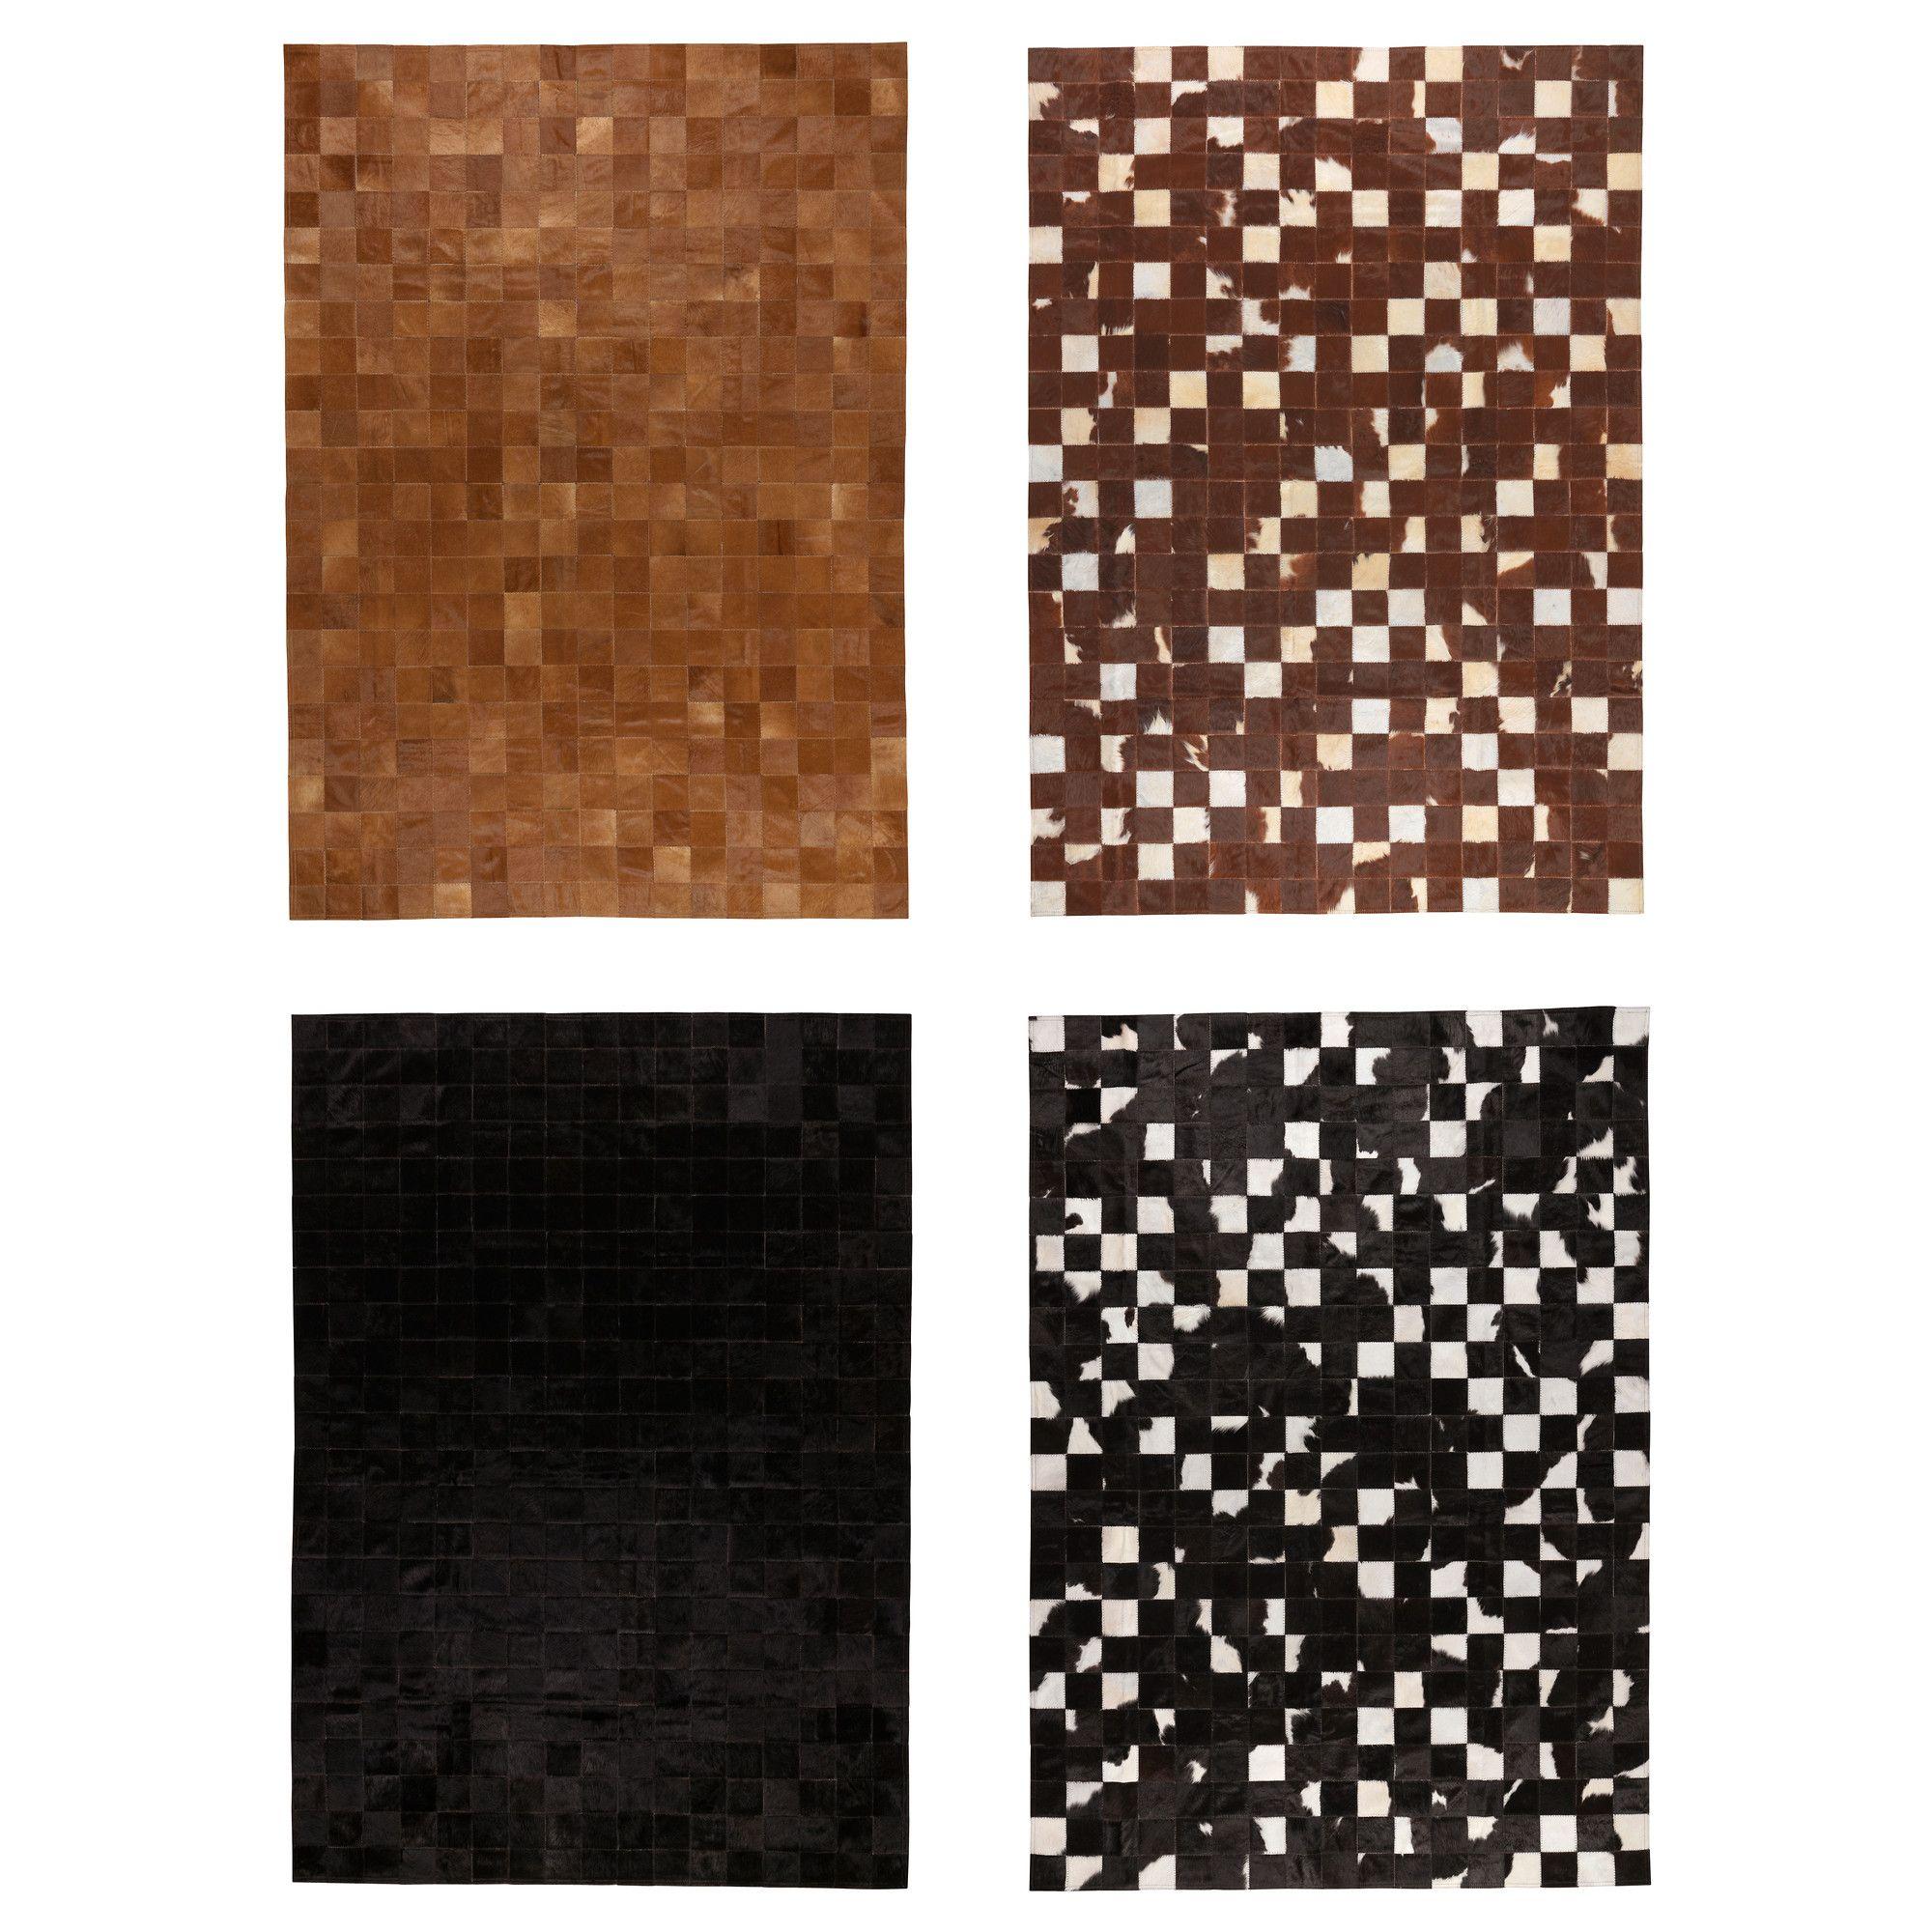 ikea has patchwork hide rugs hadsten cowhide ikea. Black Bedroom Furniture Sets. Home Design Ideas